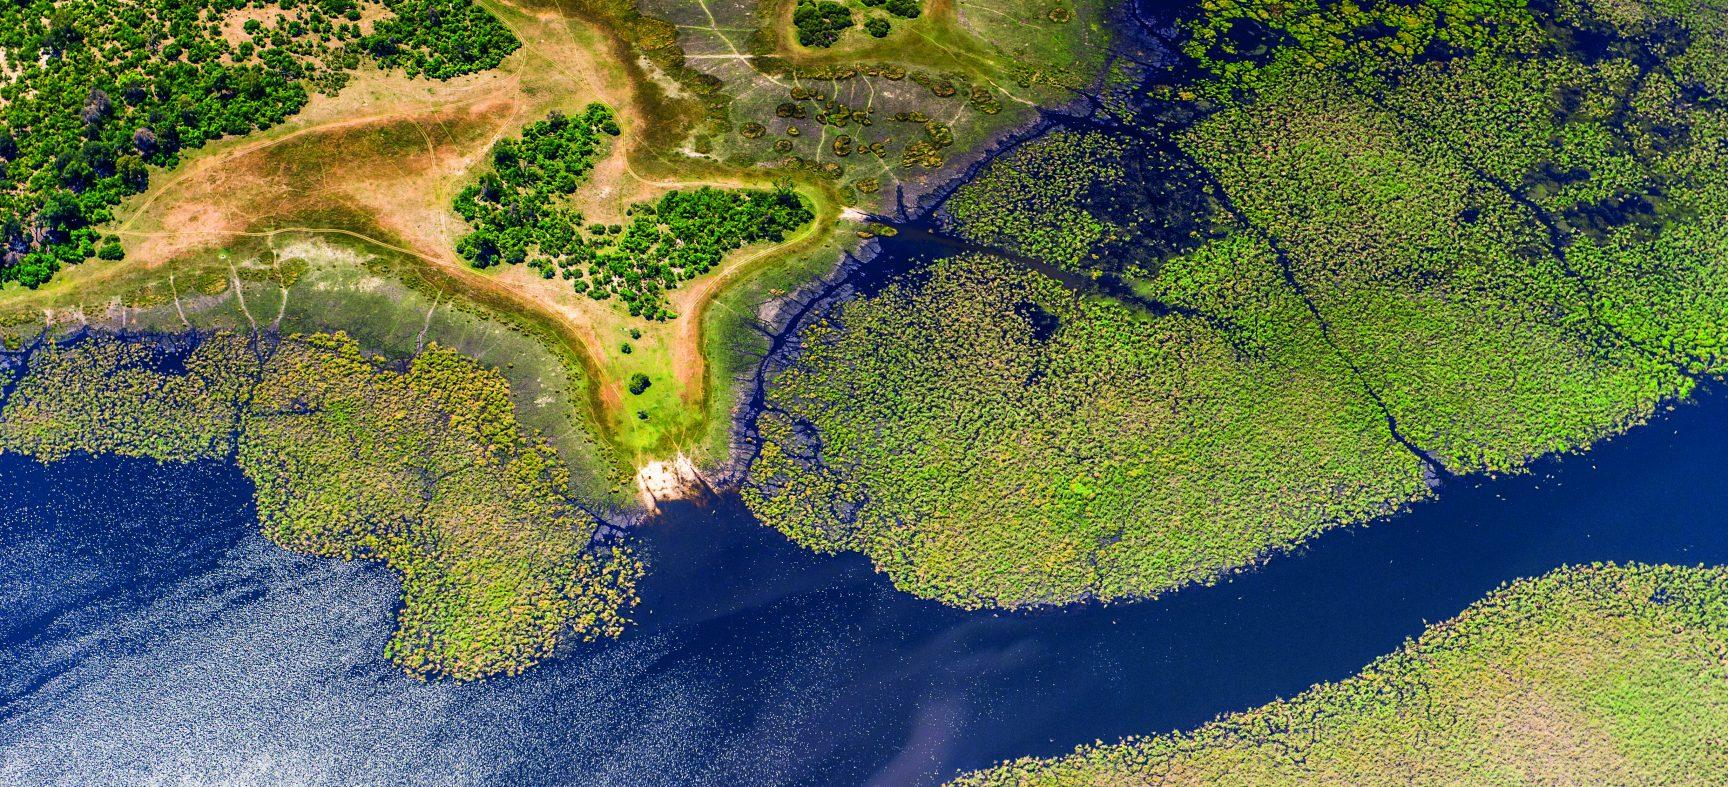 New fund targets long-term protection of the Cubango-Okavango River Basin